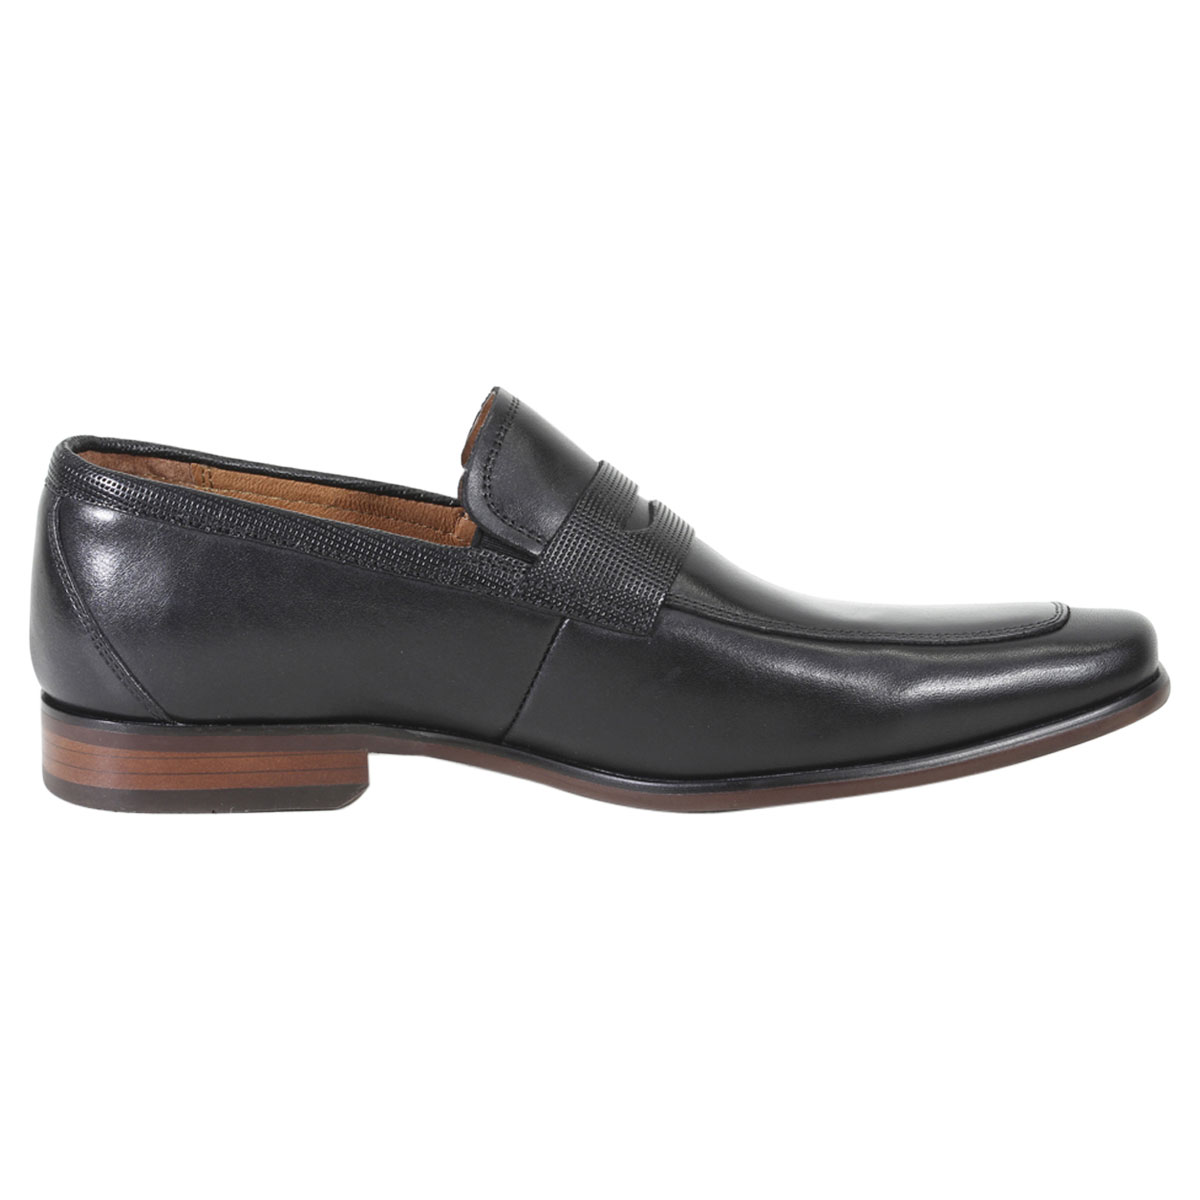 Florsheim-Men-039-s-Postino-Penny-Loafers-Shoes thumbnail 12